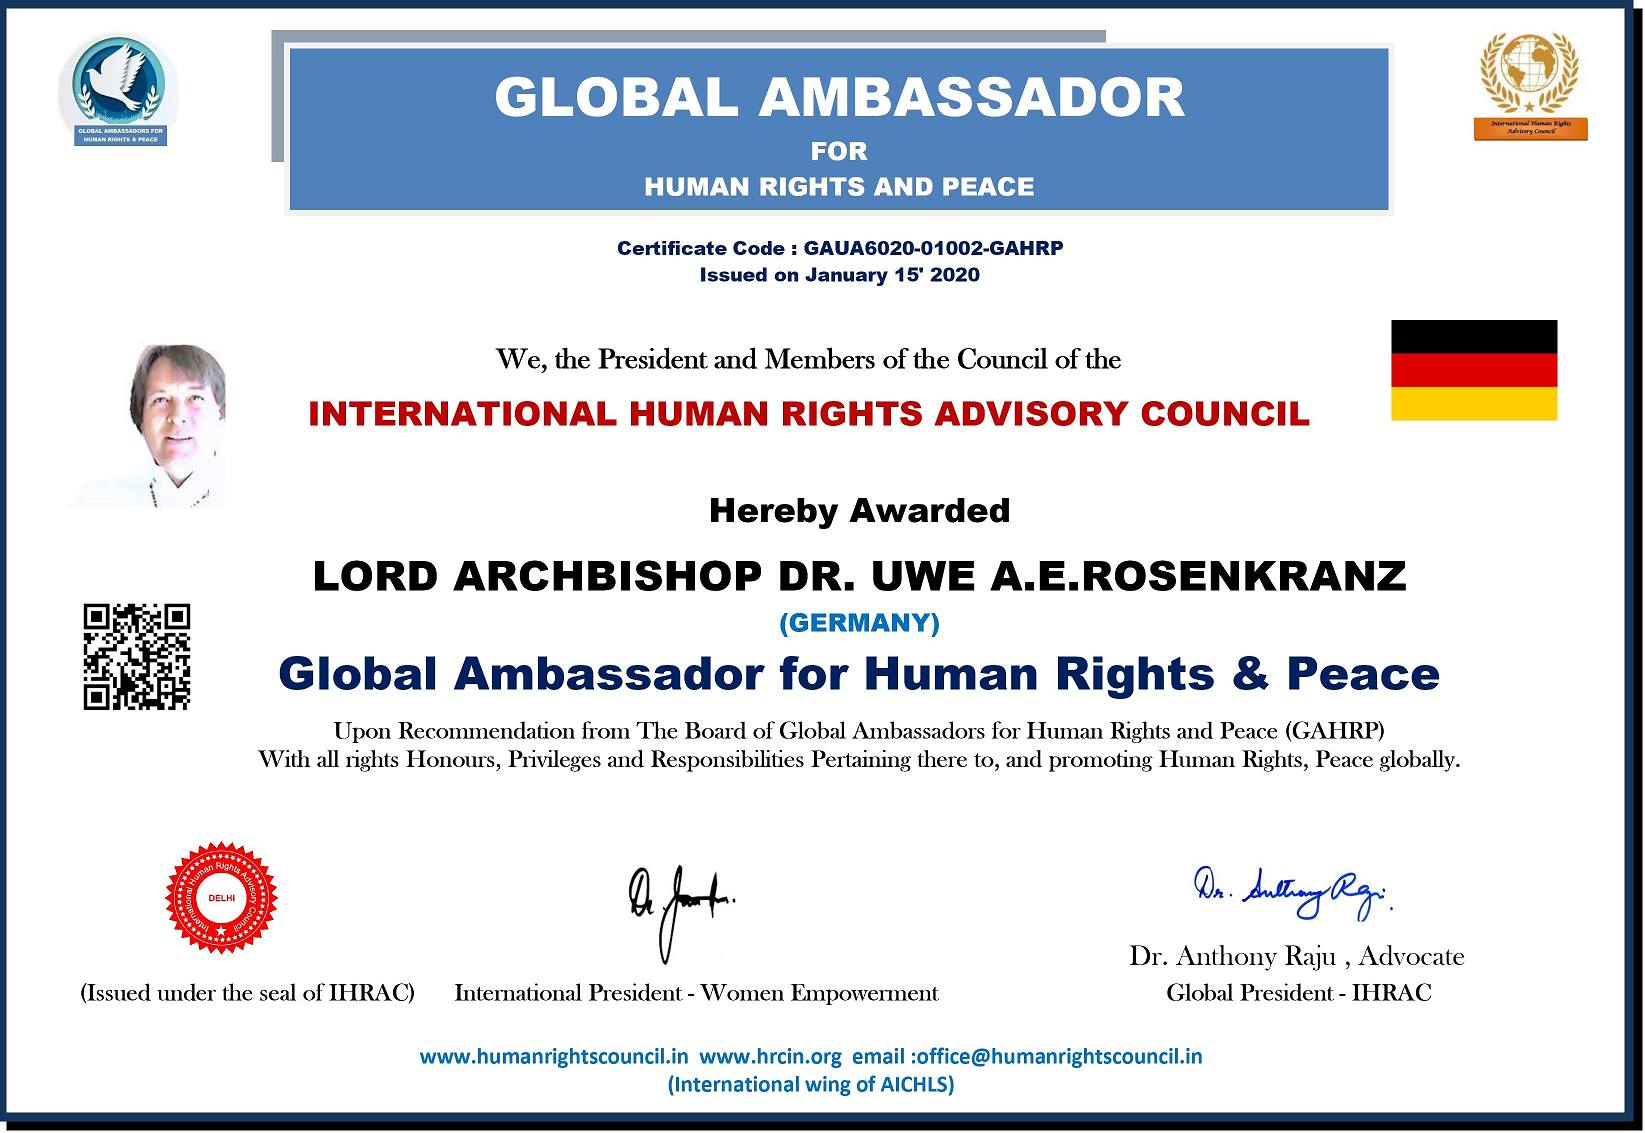 Ambassador LAD Rosenkranz